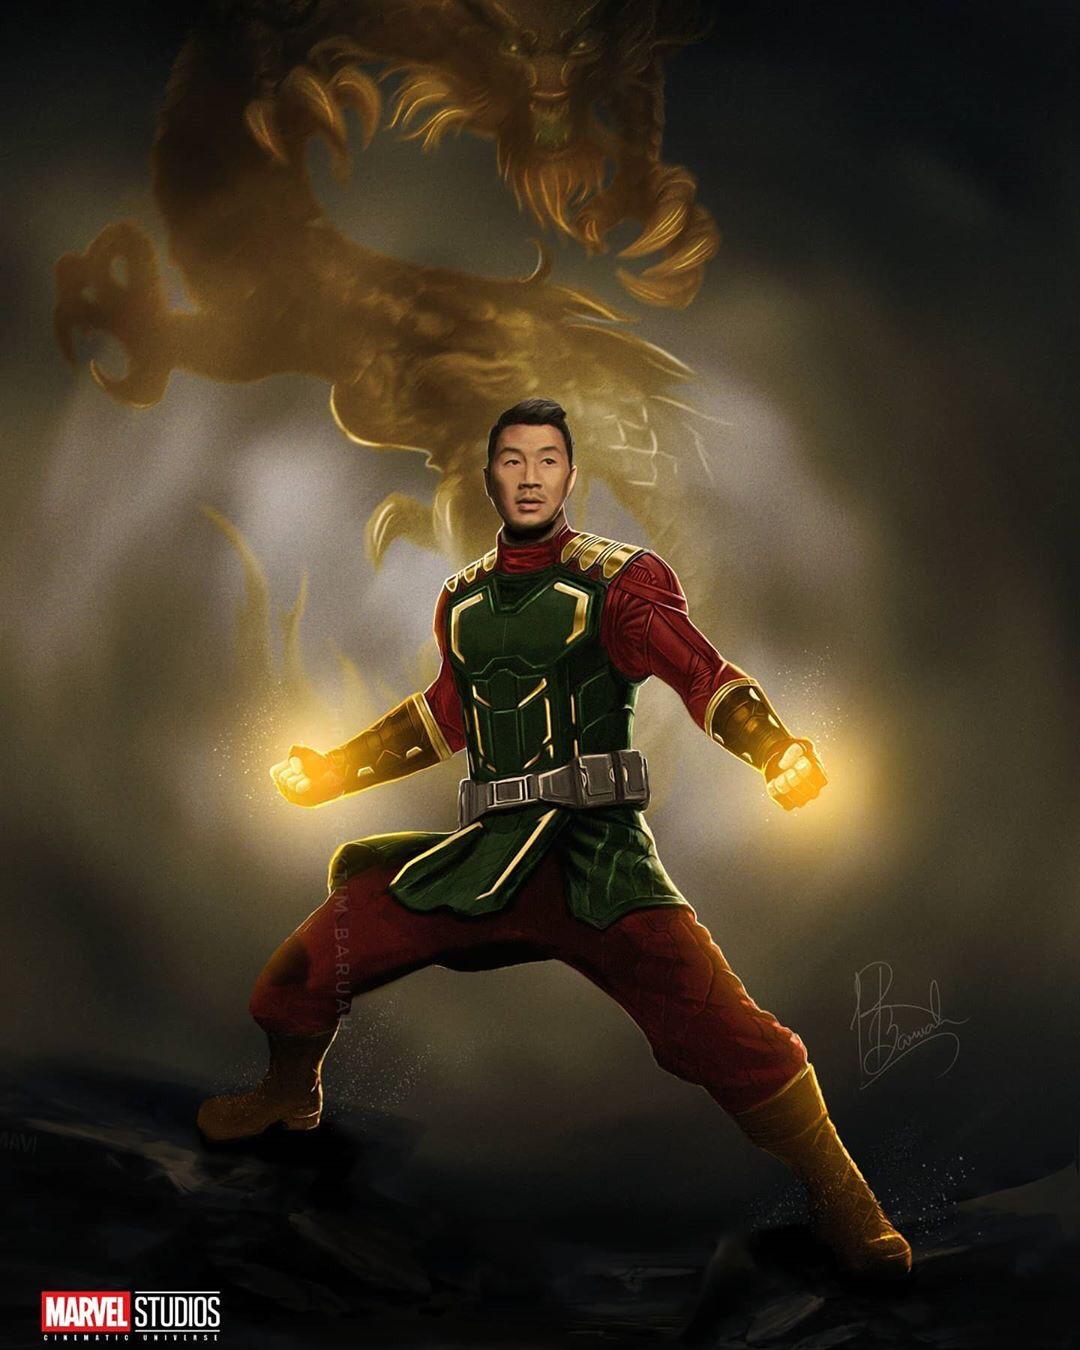 Simu Liu as Shang-Chi Fan Art by Hriday Raktim